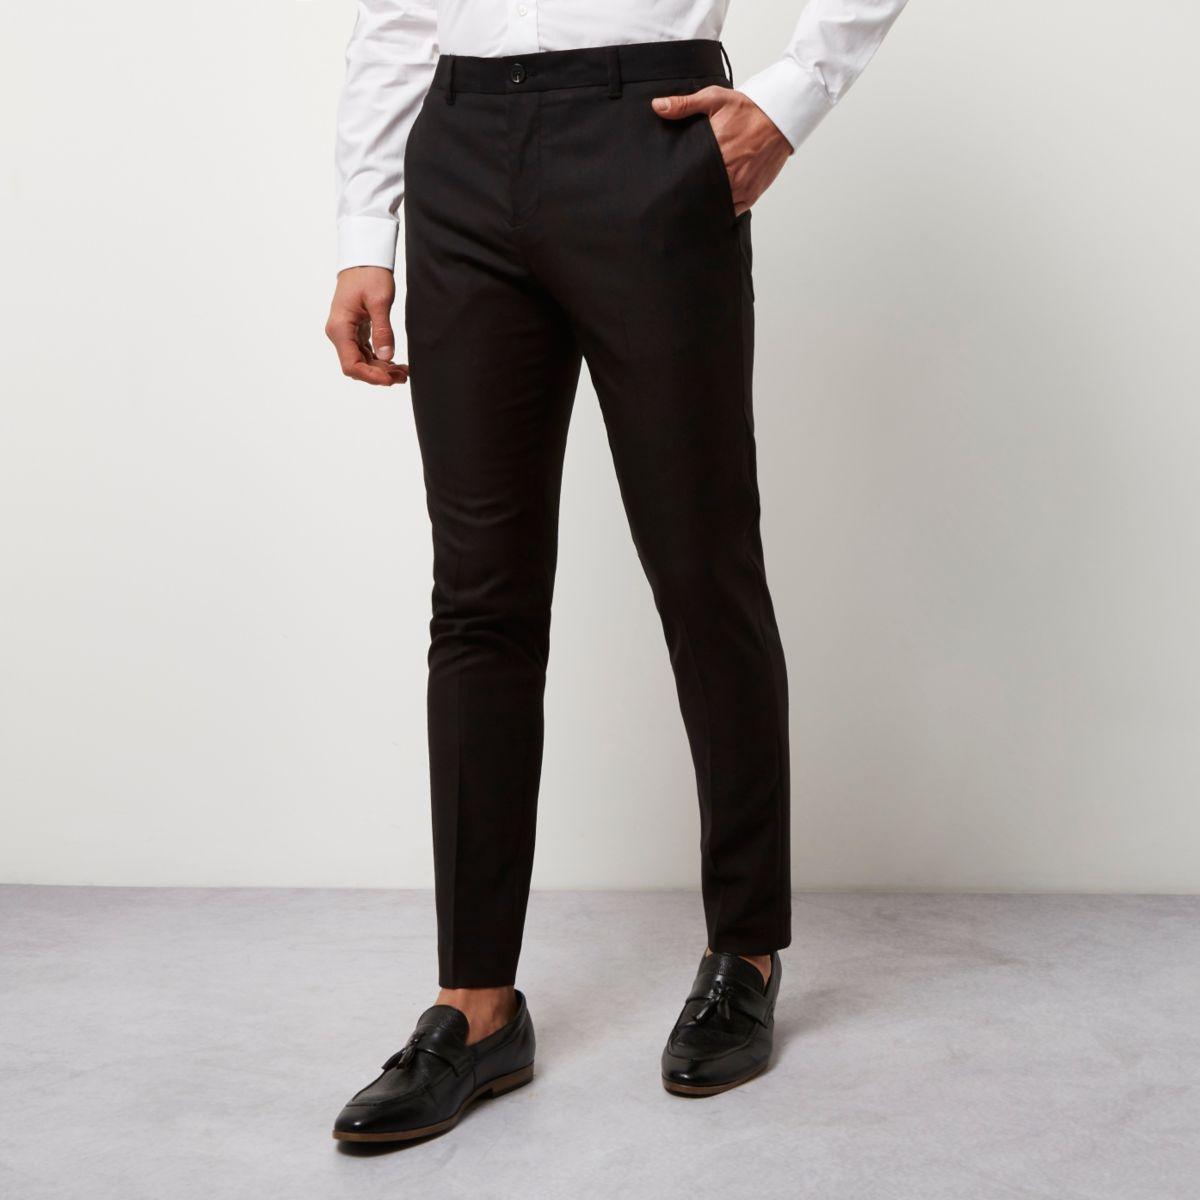 Zwarte nette skinny broek